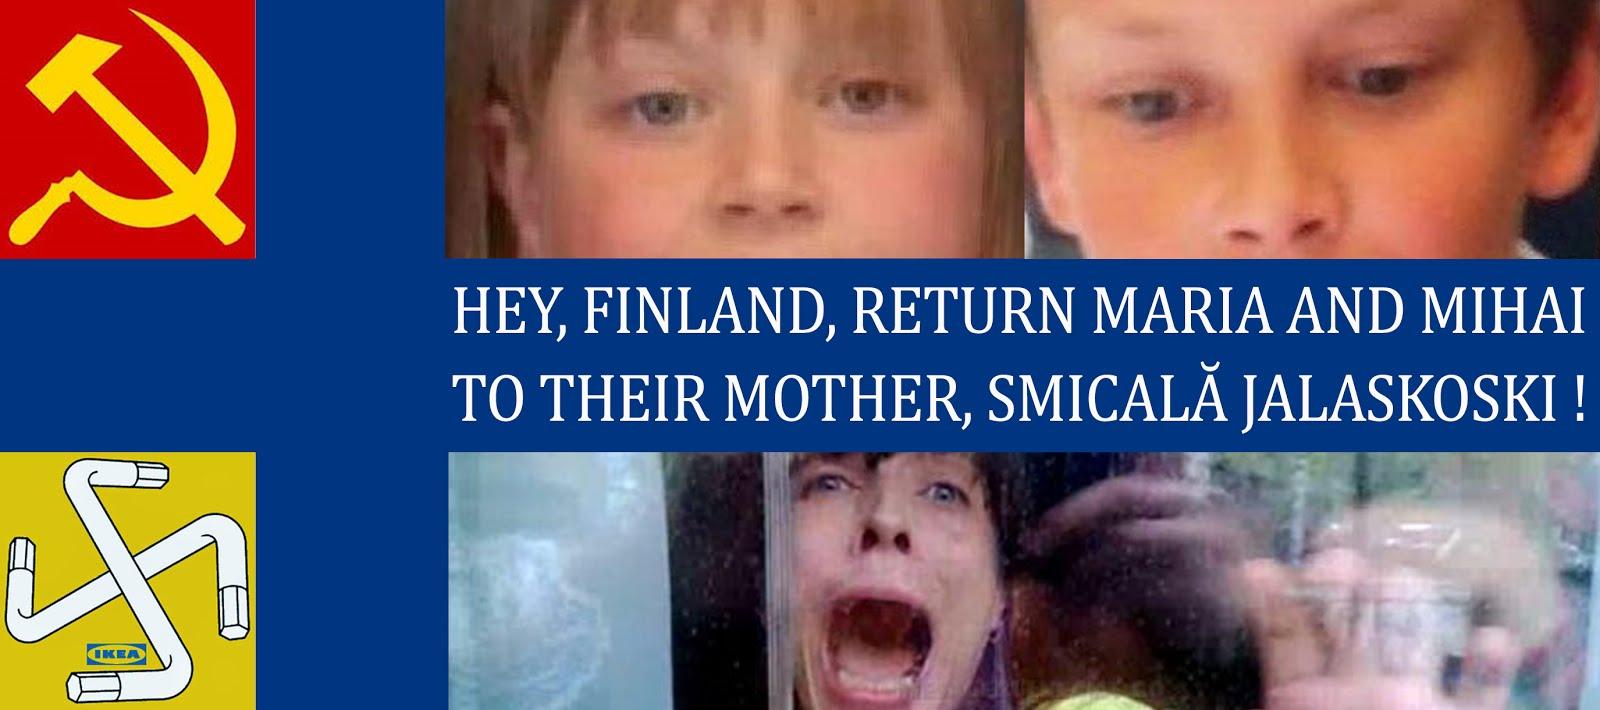 Free Maria and Mihai Smicala Jalaskoski!